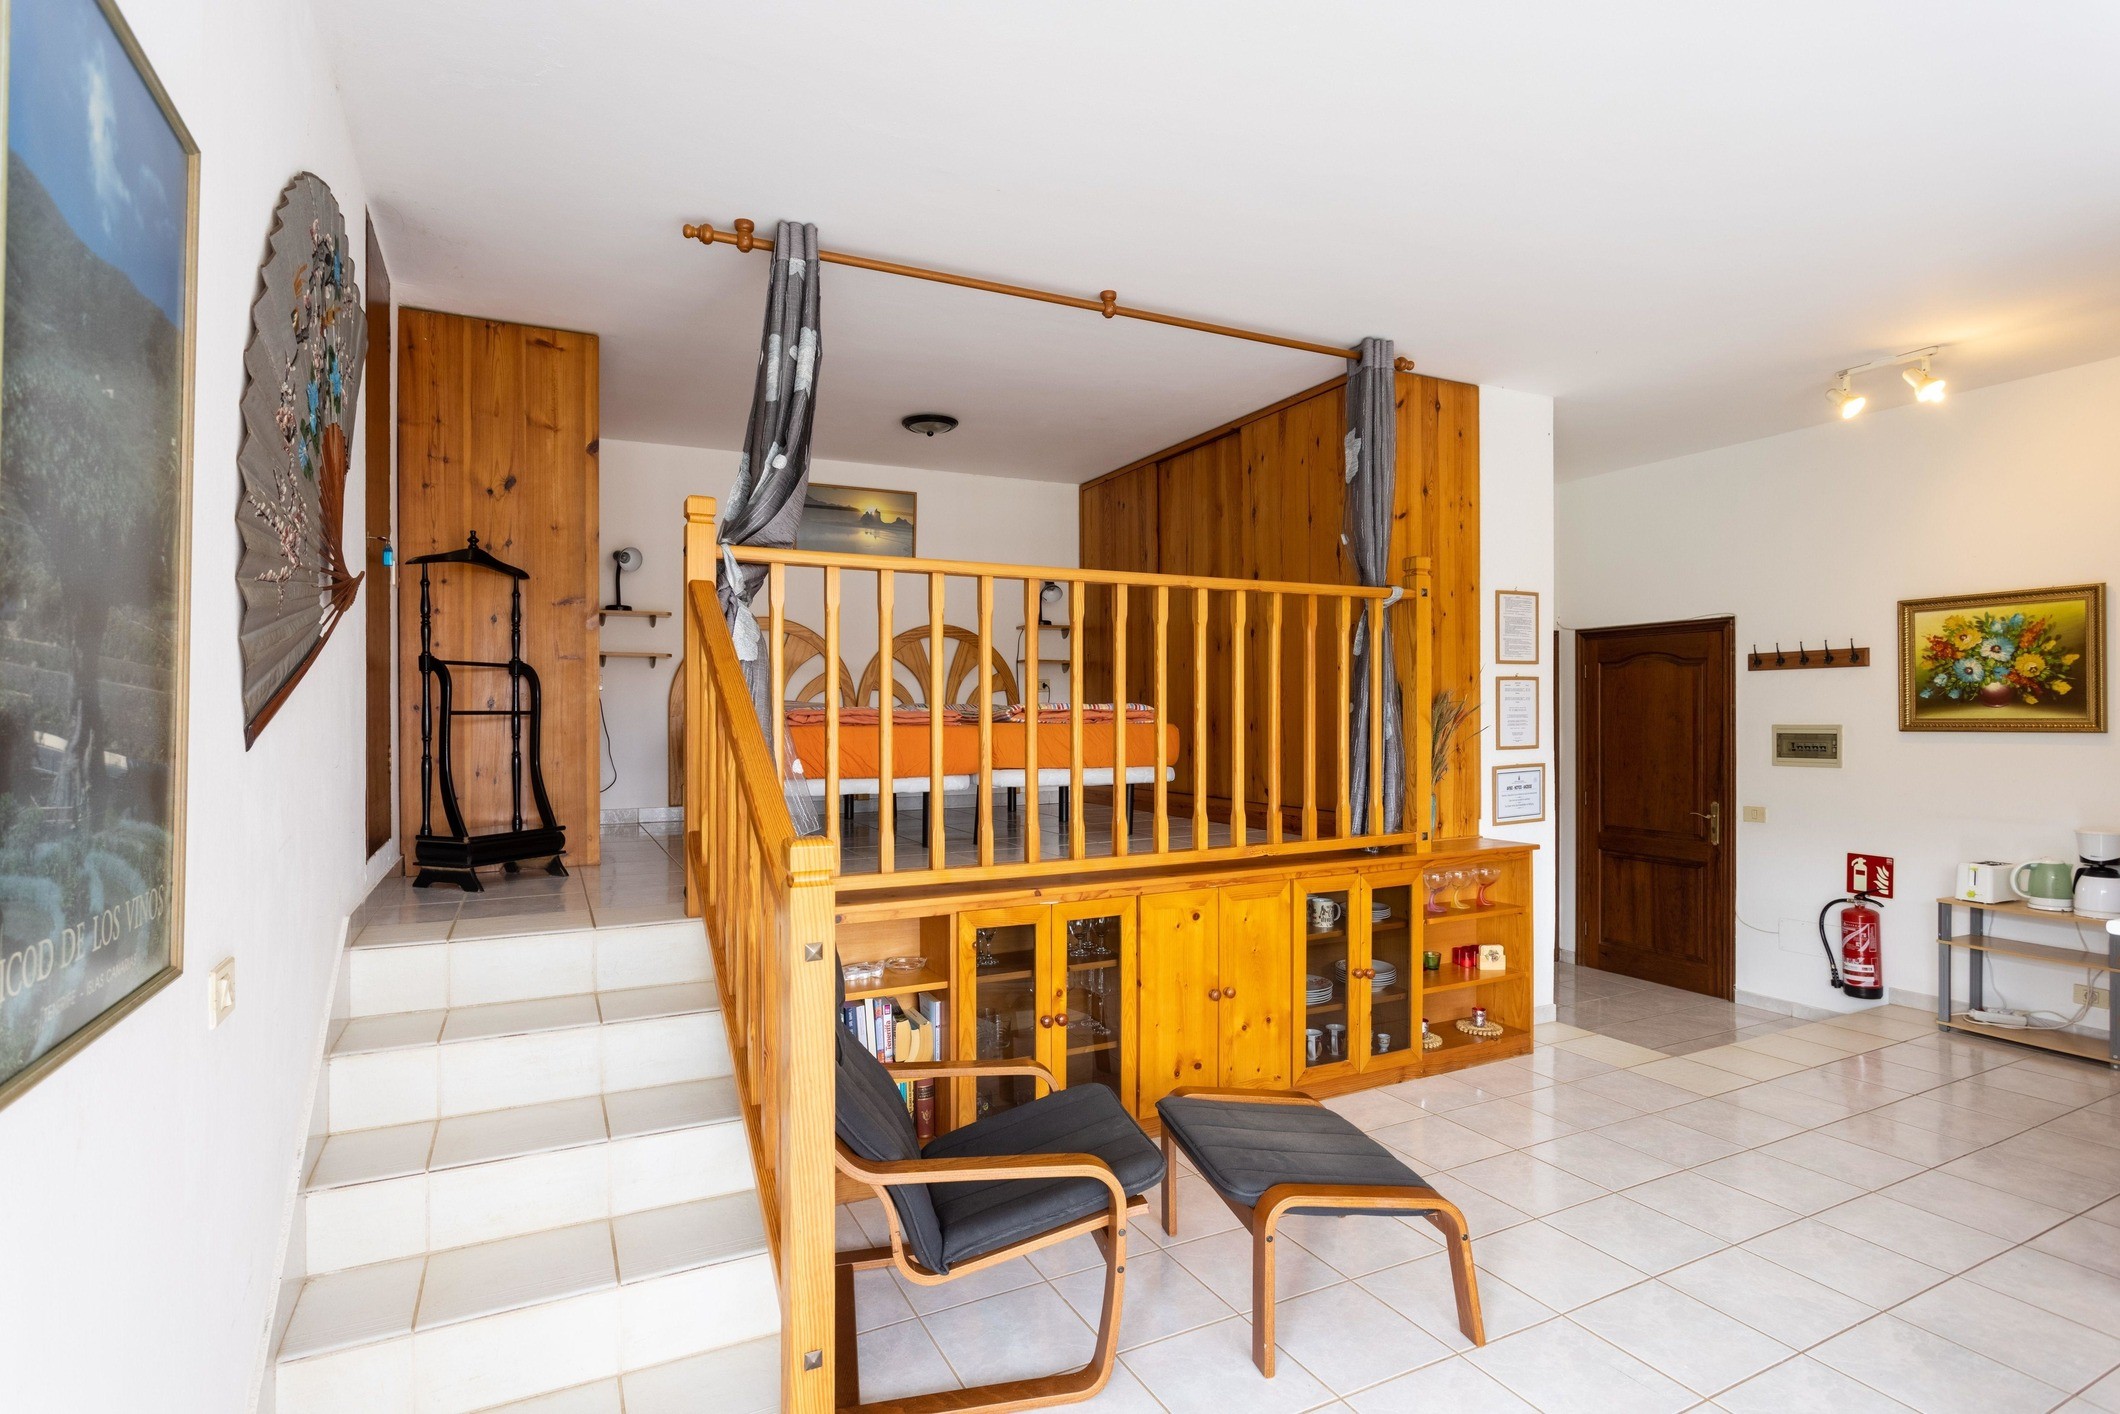 Appartement de vacances Fewo Strelitzia, im Grünen, am kleinen See, direkt am Strelitziengarten, mit Pool, Grill,  (2492987), Santa Ursula, Ténérife, Iles Canaries, Espagne, image 9